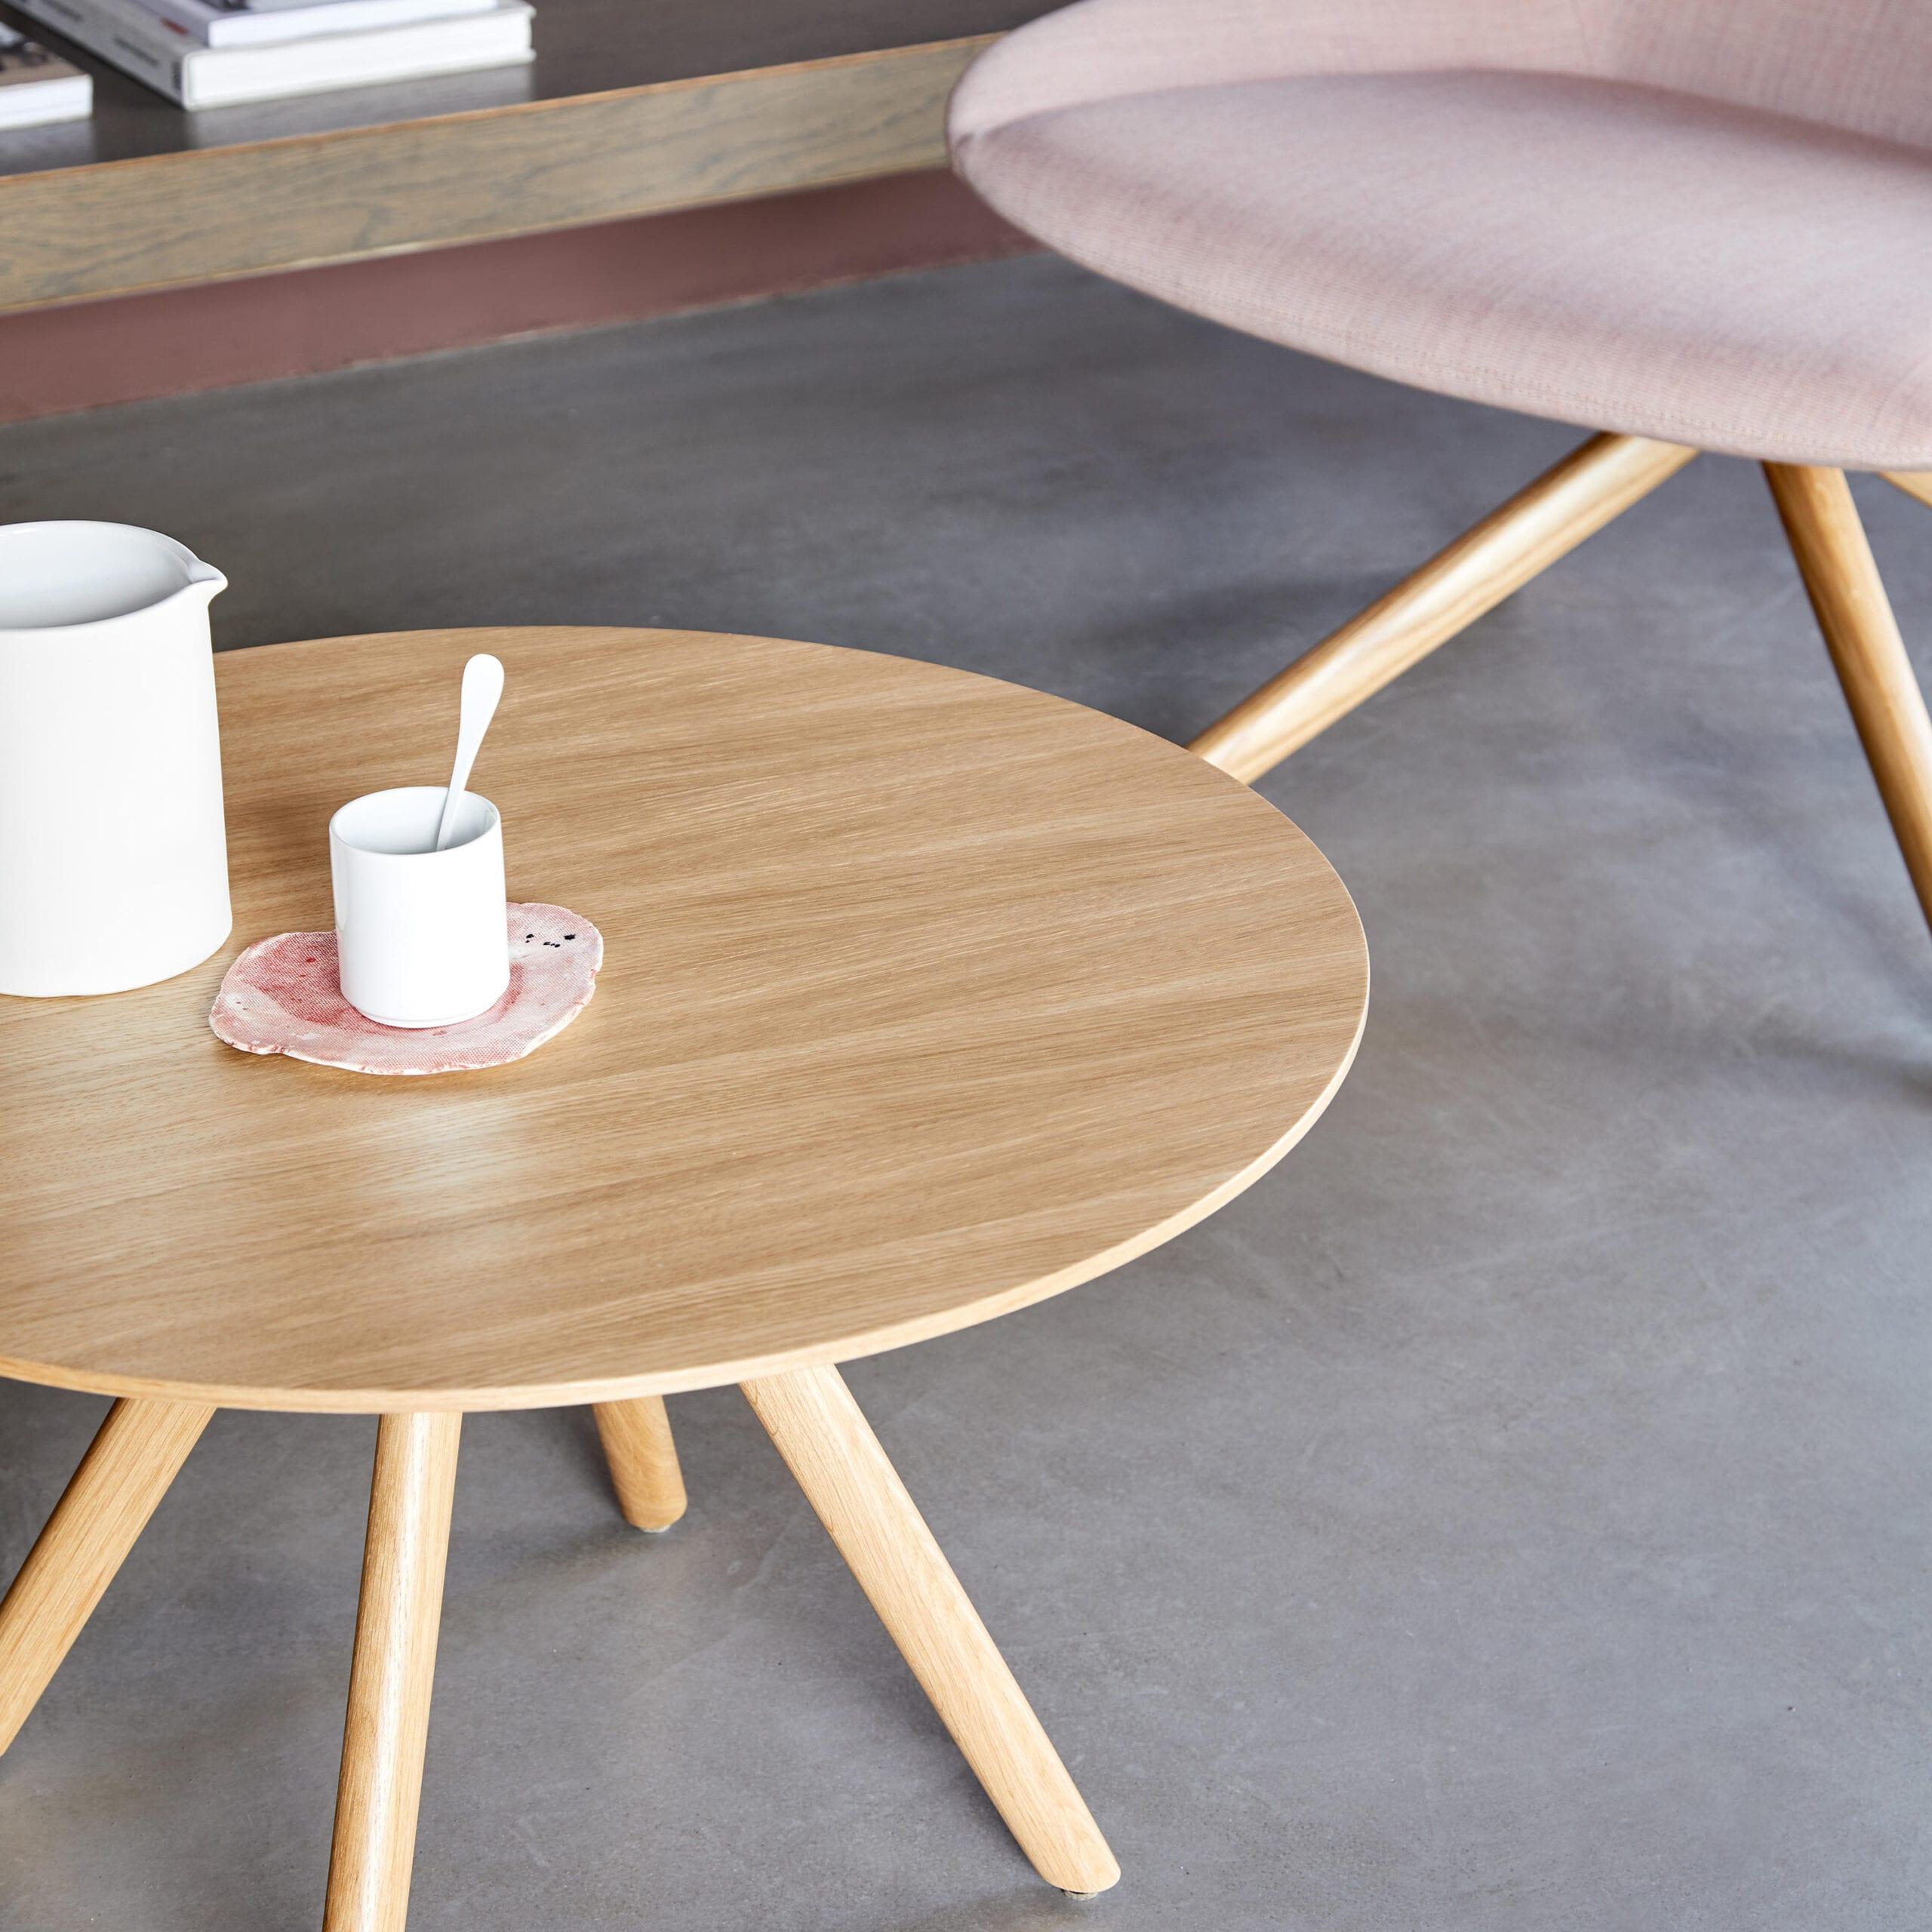 STIKS COFFE TABLE